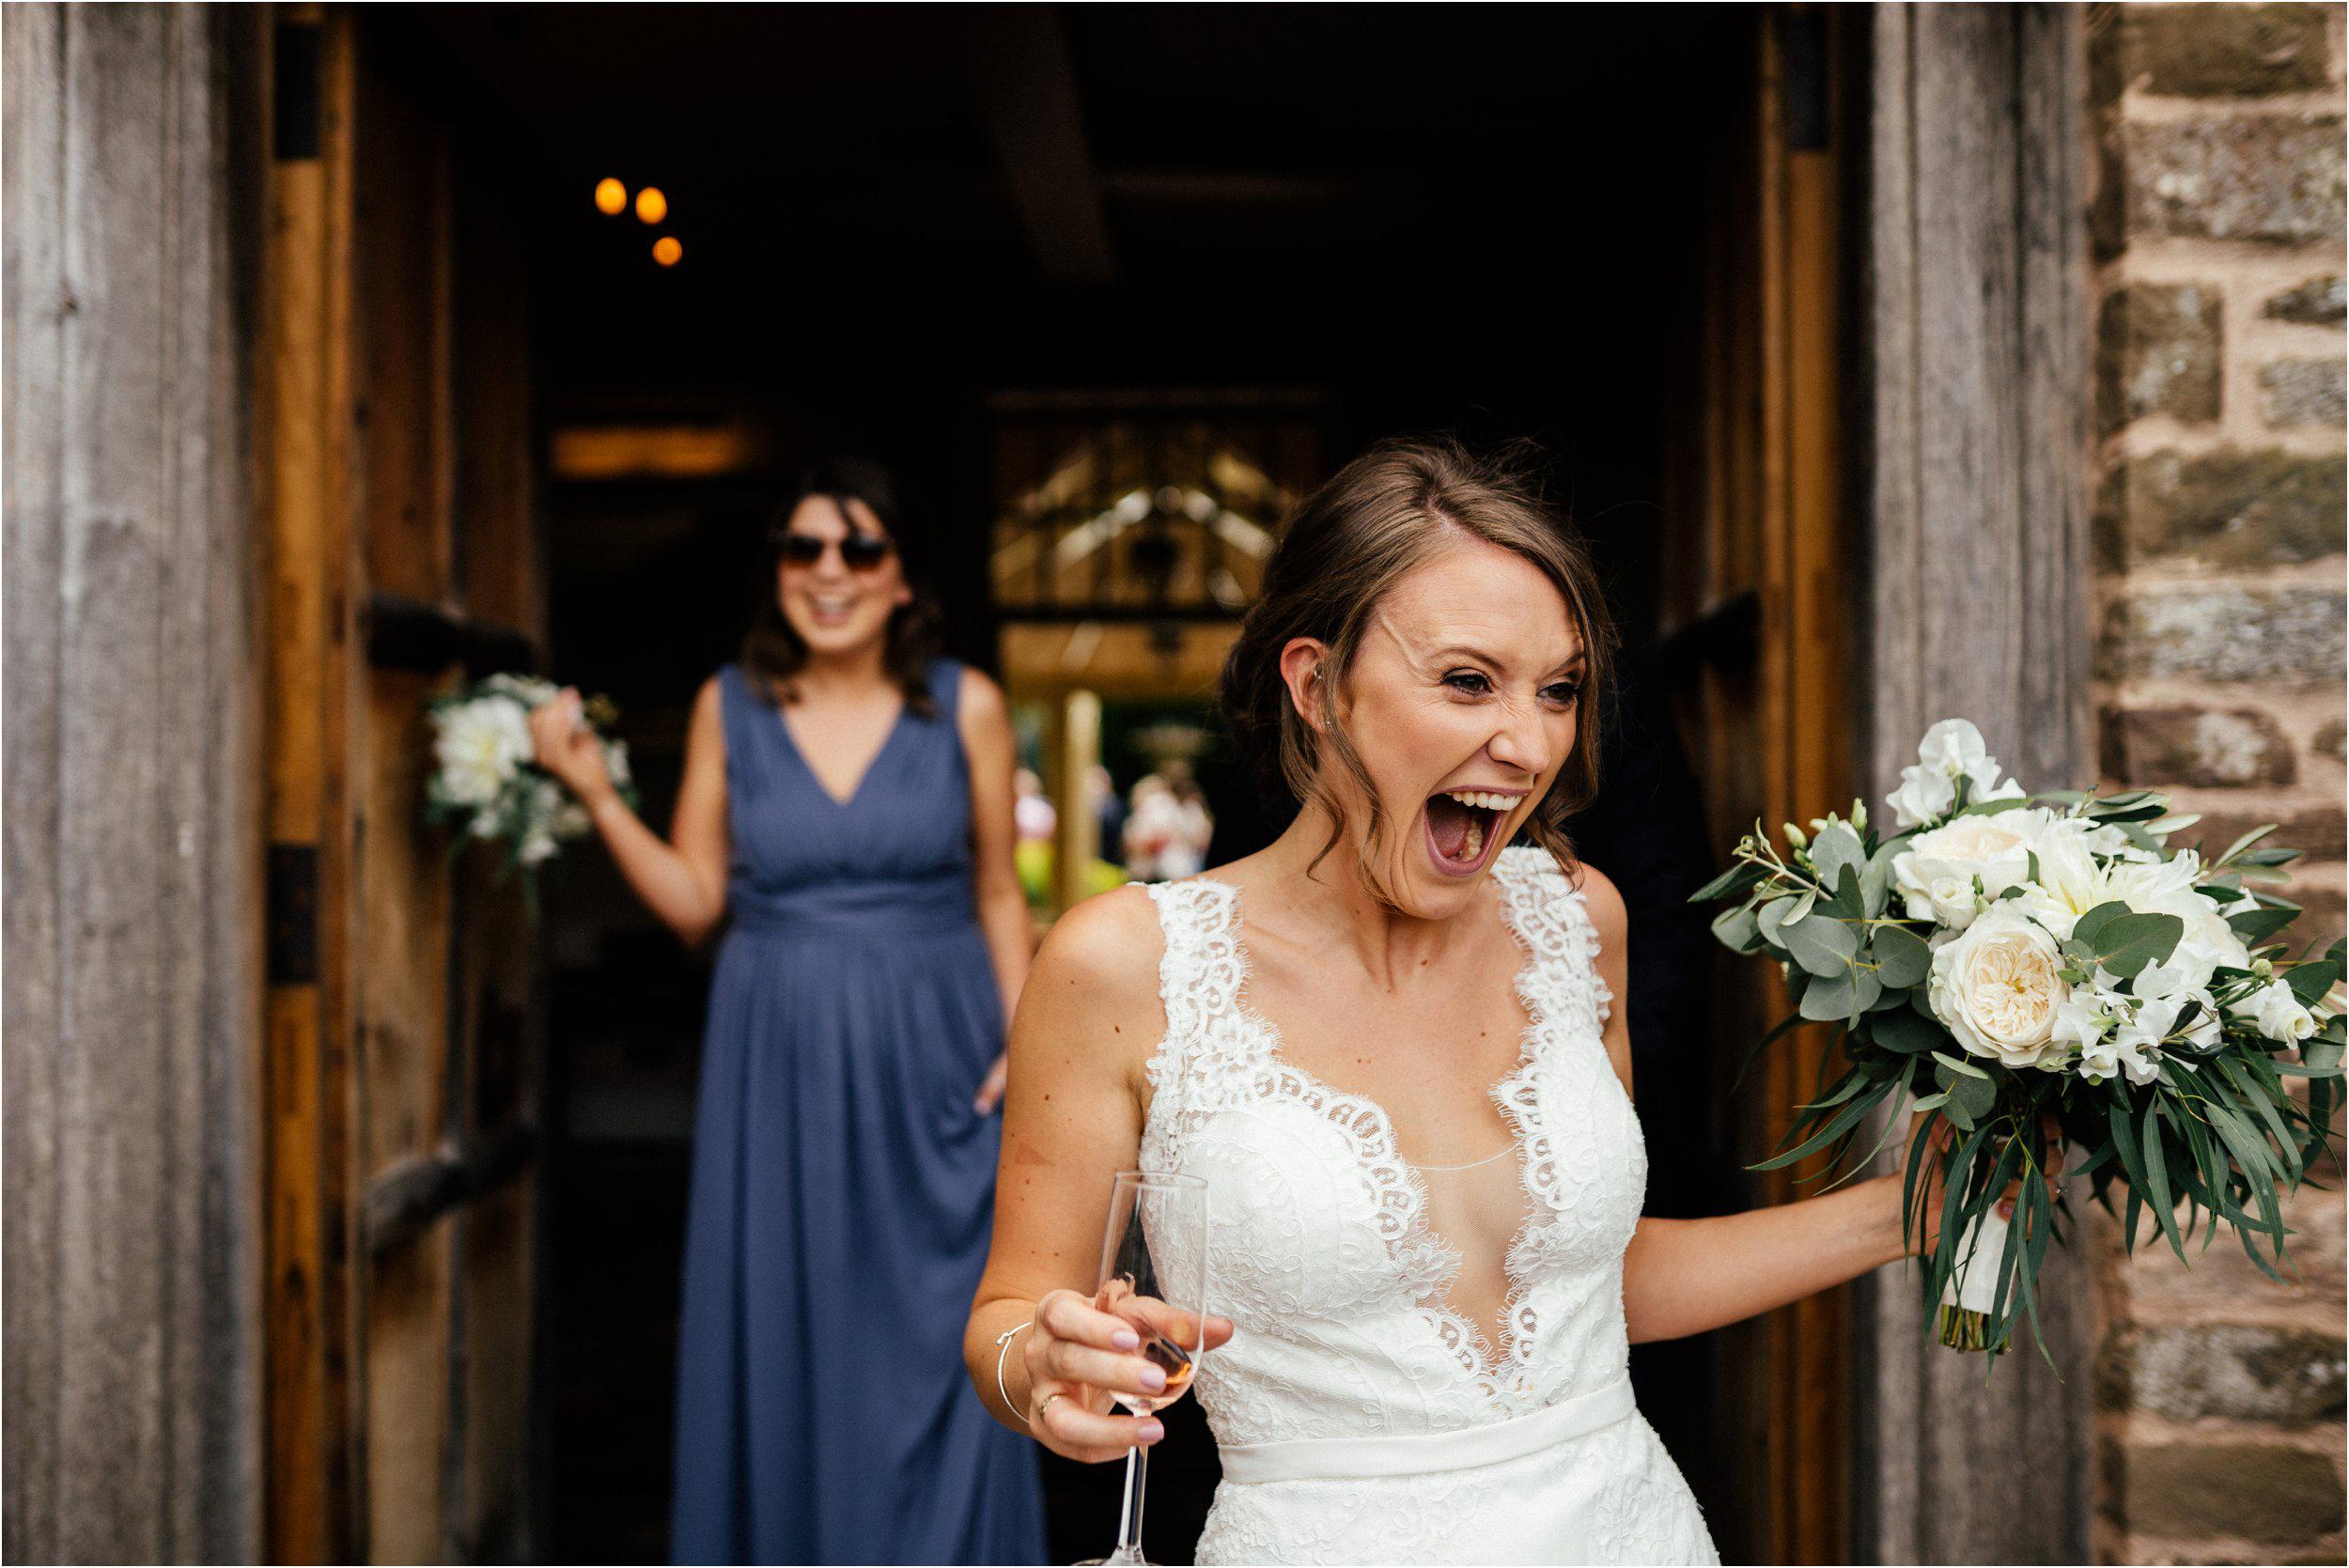 Dewsall Court Herefordshire wedding photographer_0066.jpg